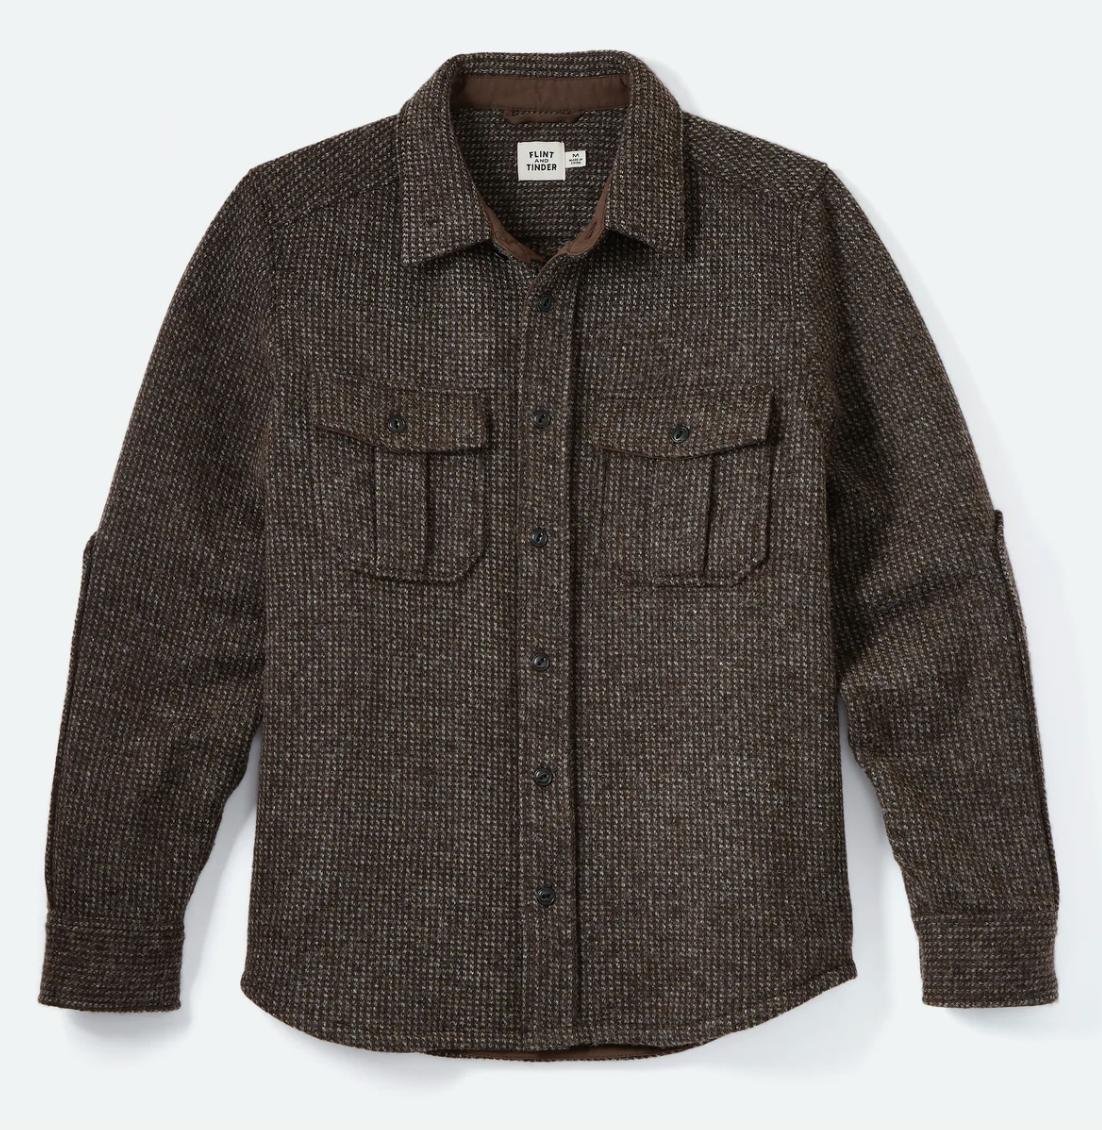 Flint and Tinder Wool Overshirt